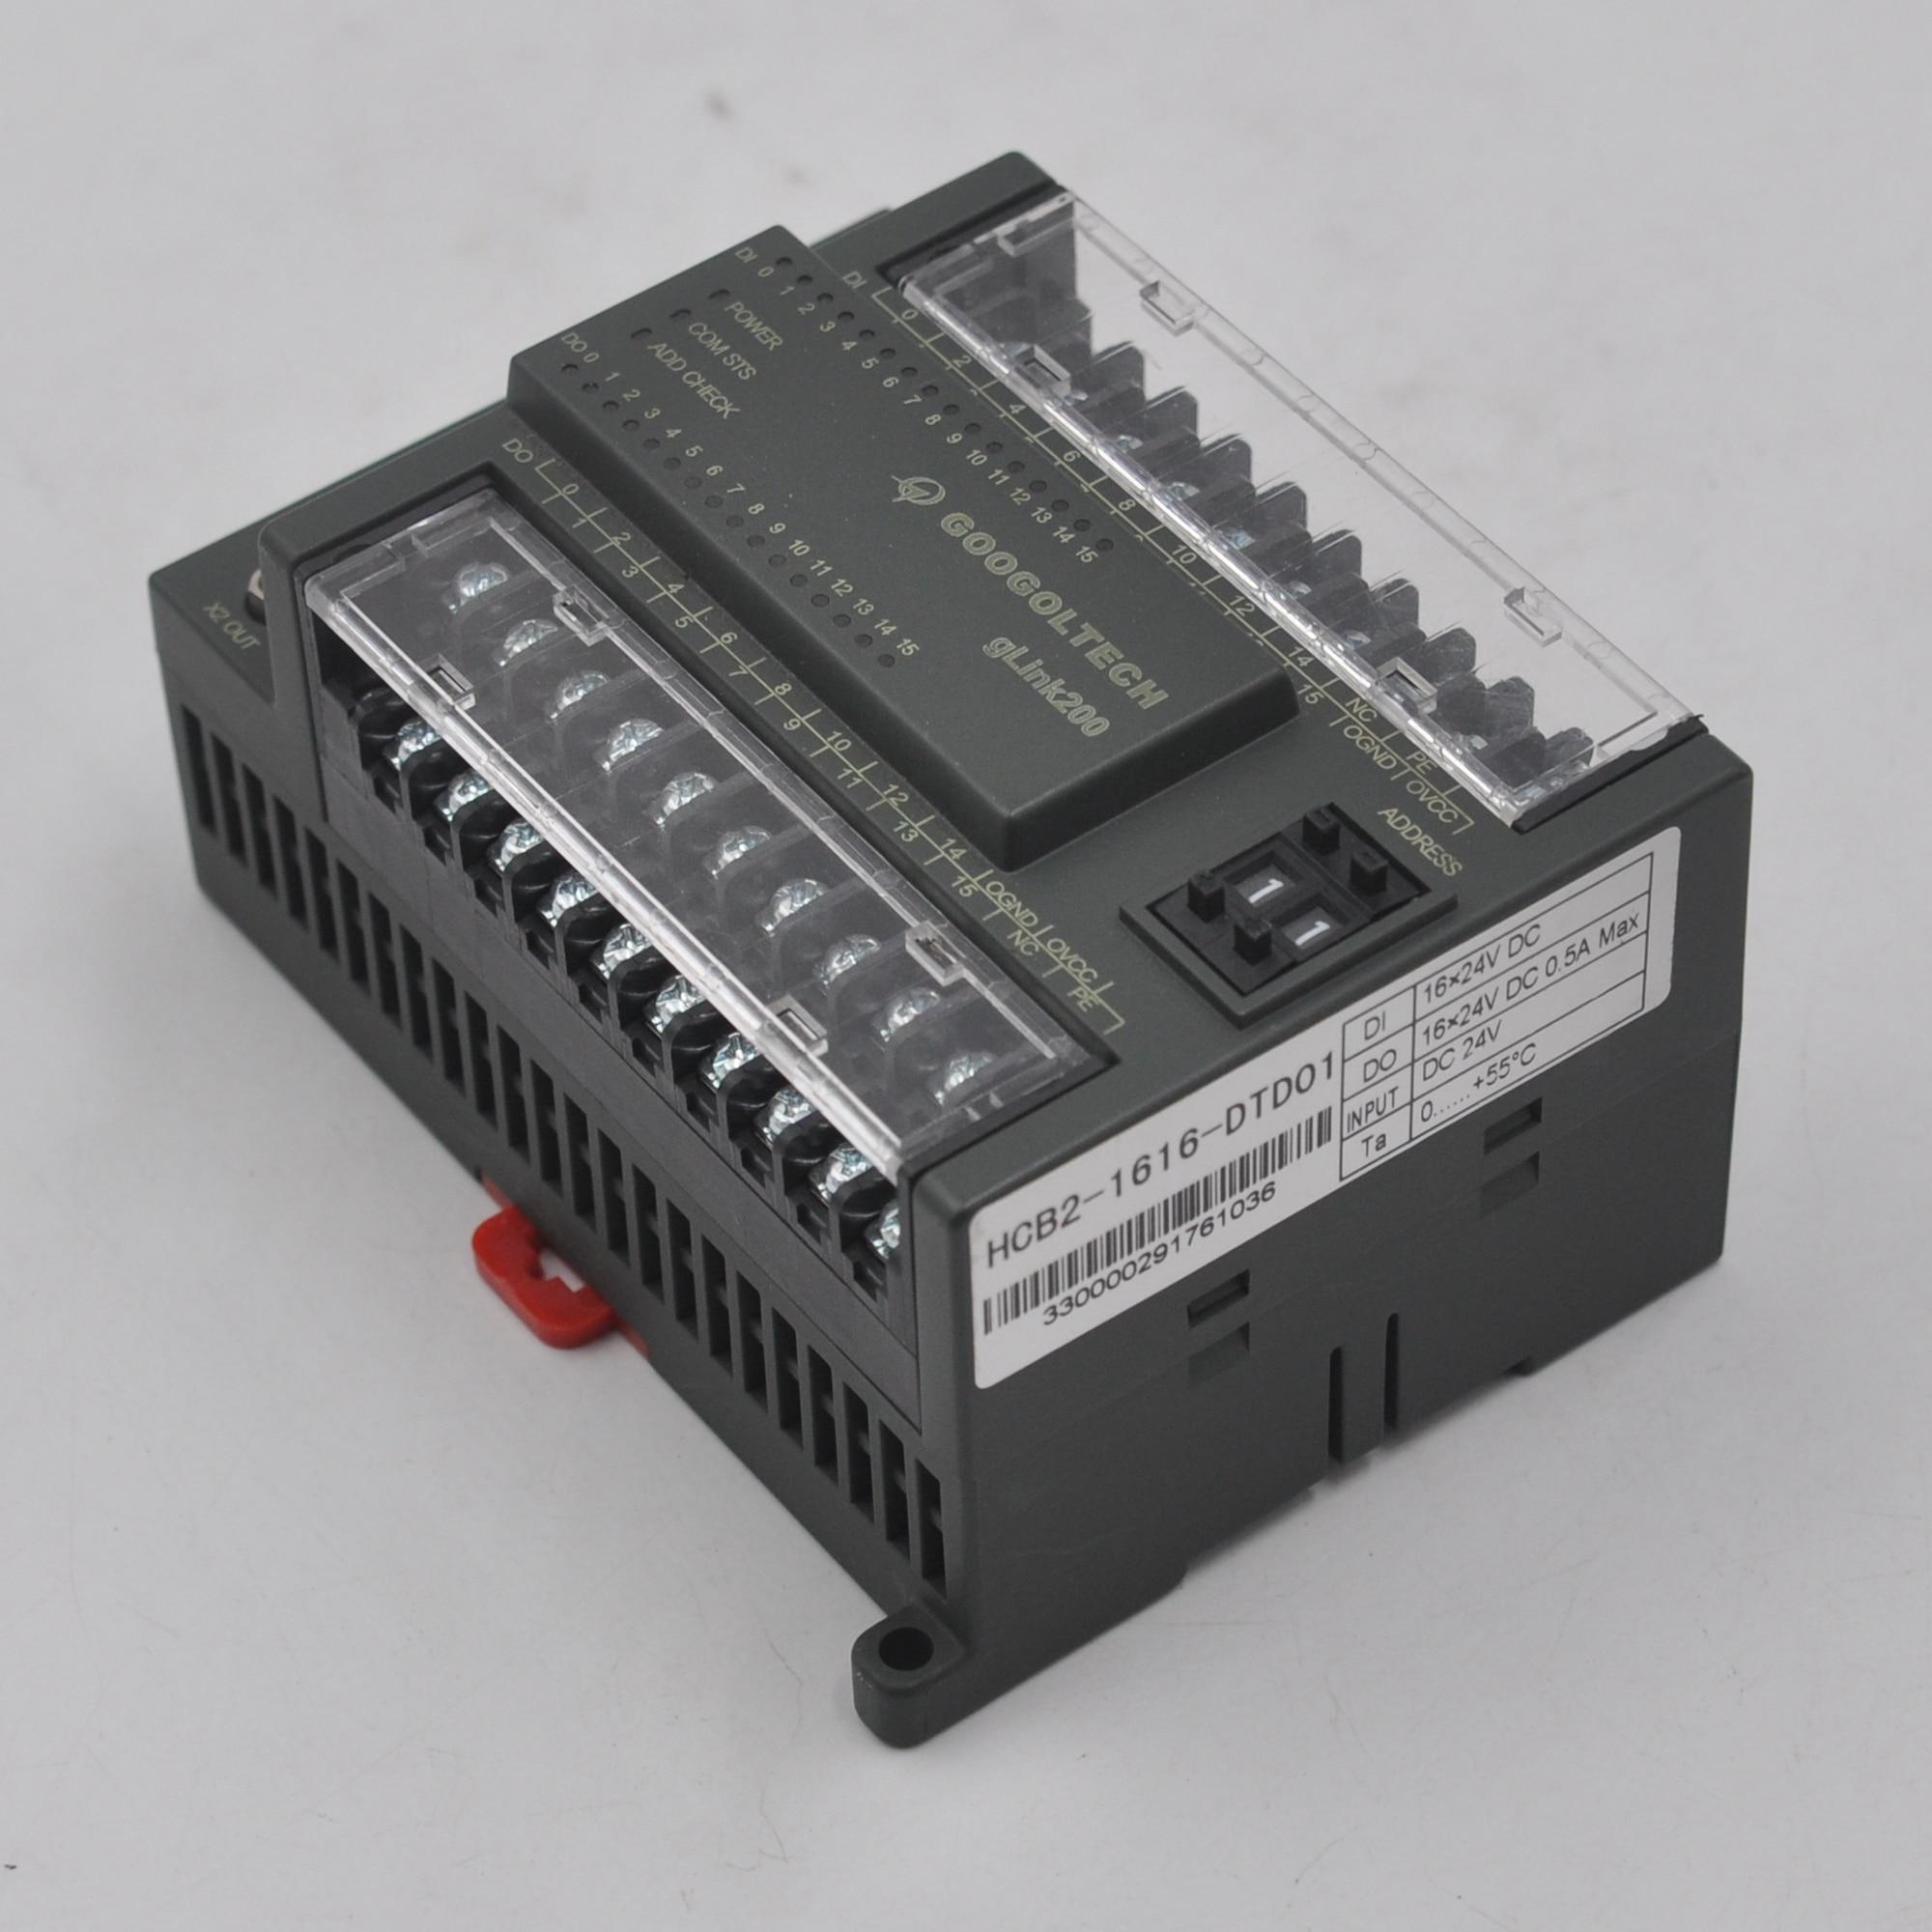 GOOGOL GLINK200 expansion IO module HCB2-1616-DTD01